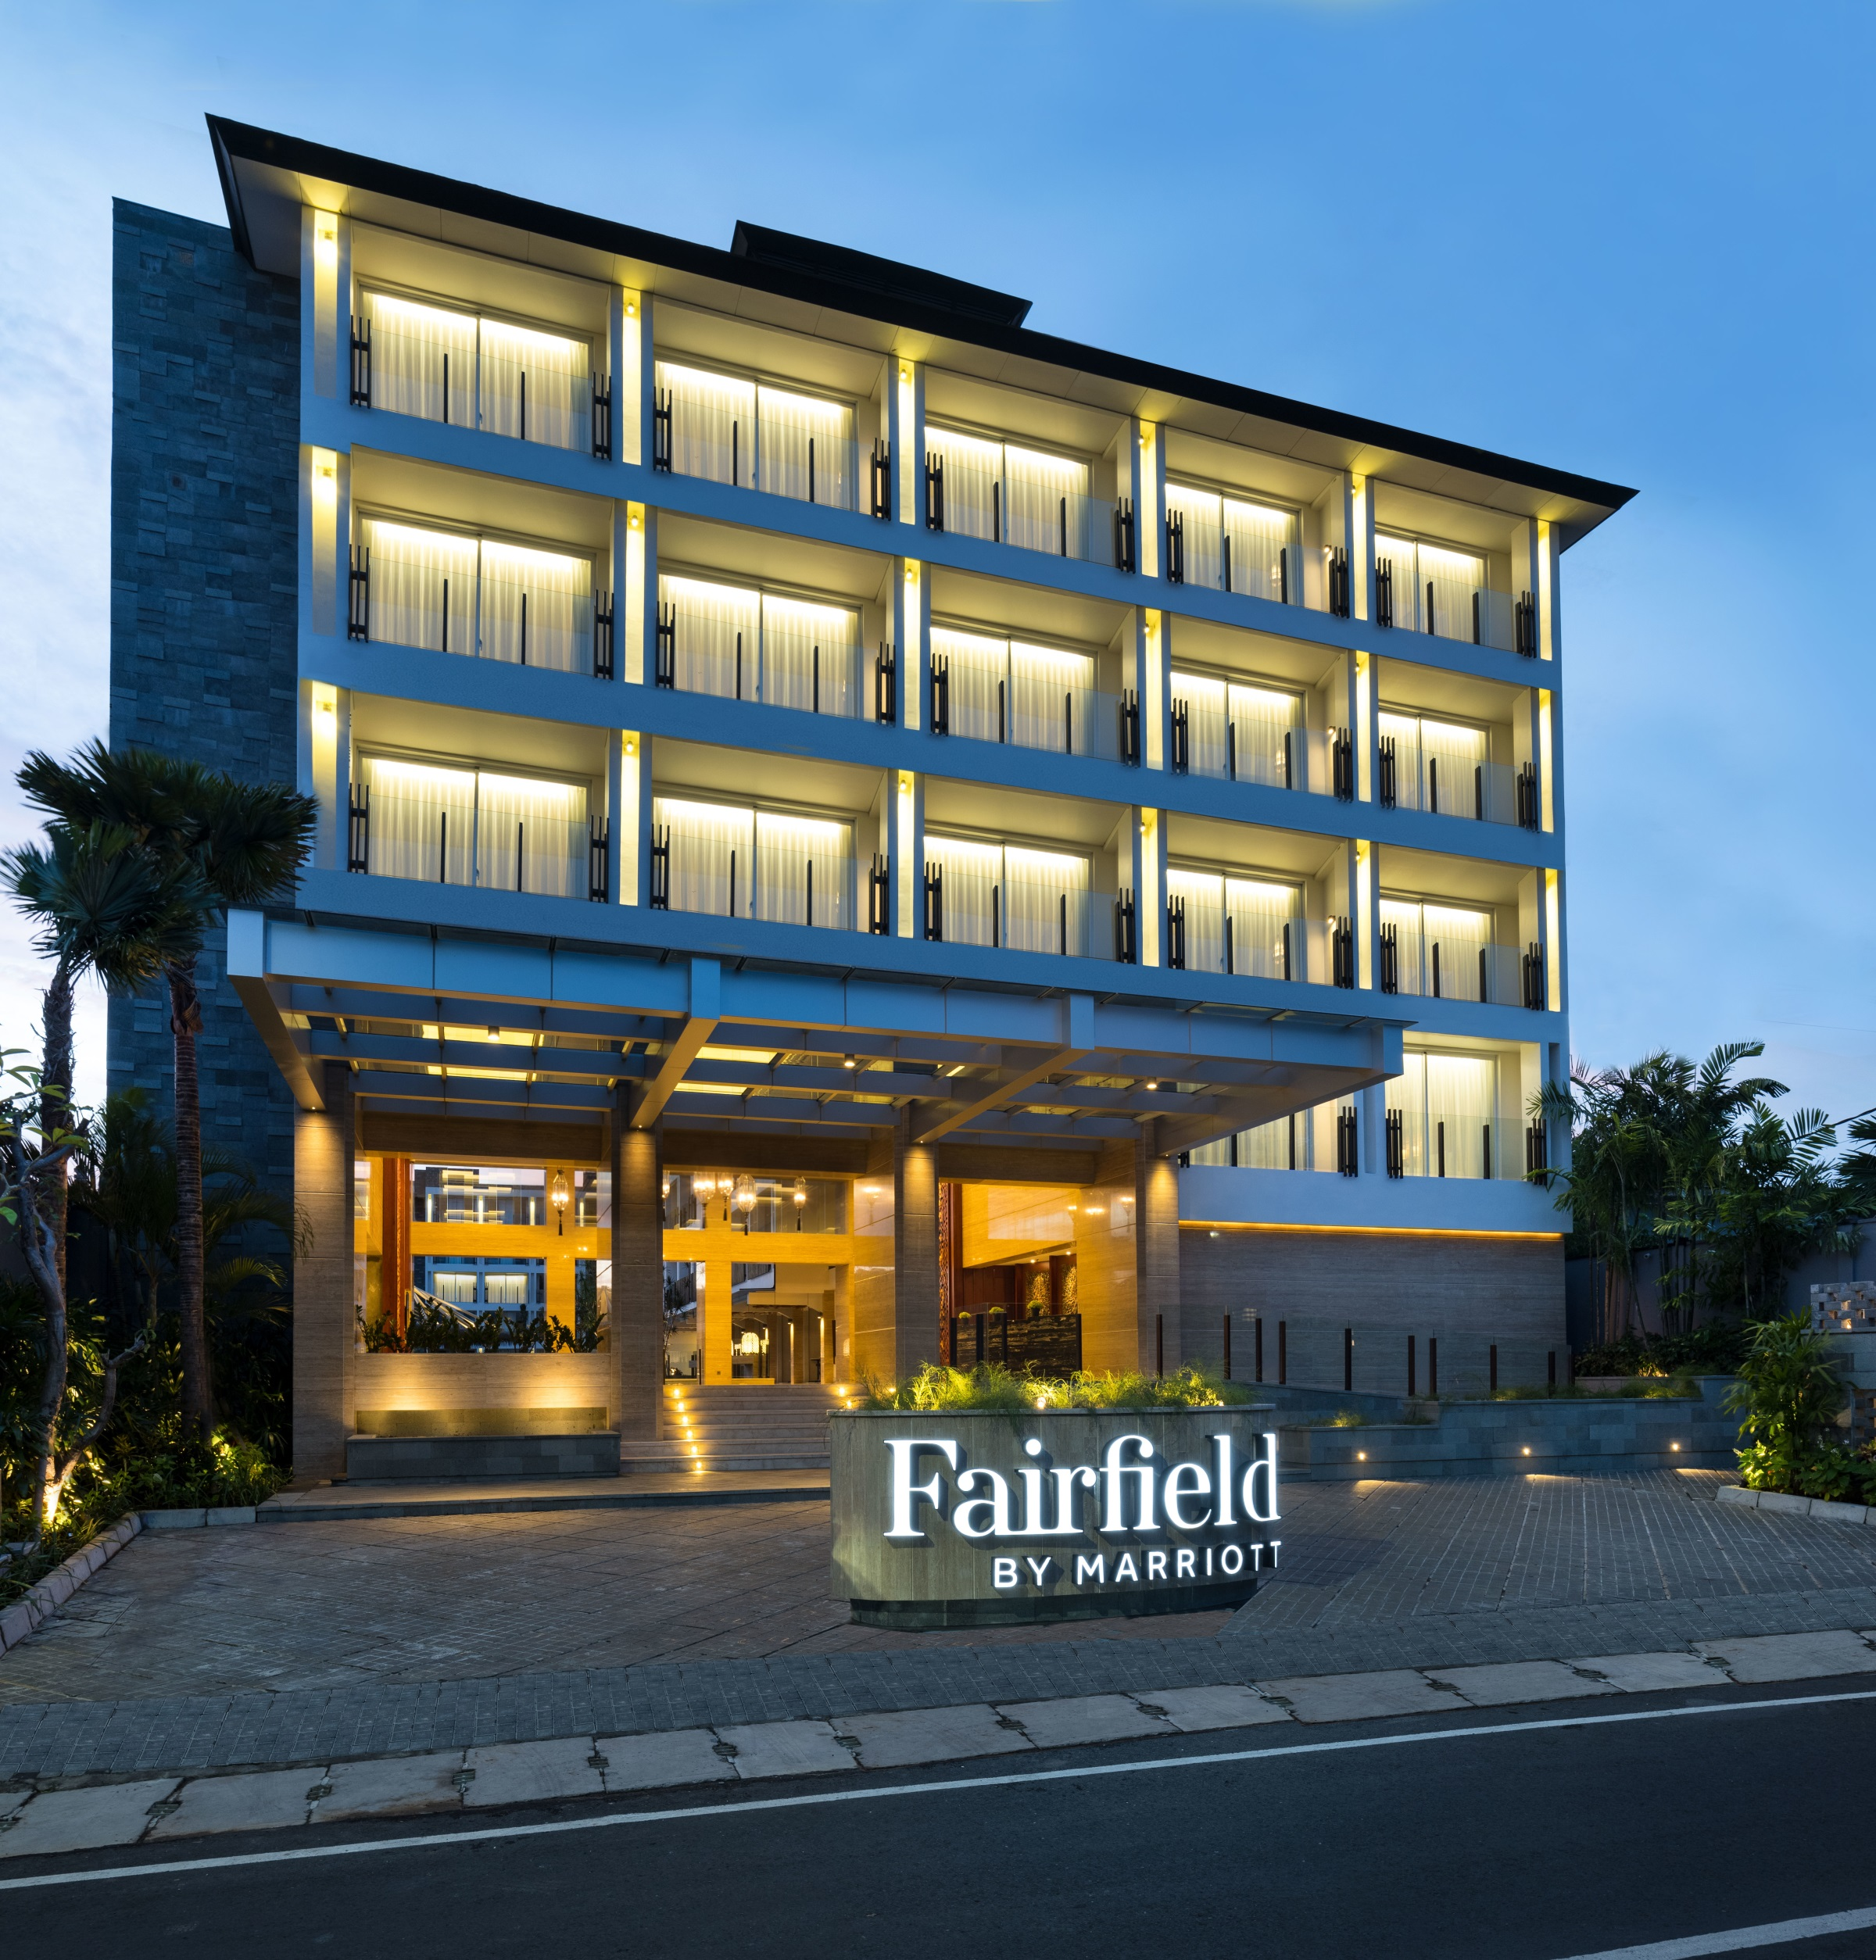 Photo Credit: Fairfield by Marriott Bali Legian